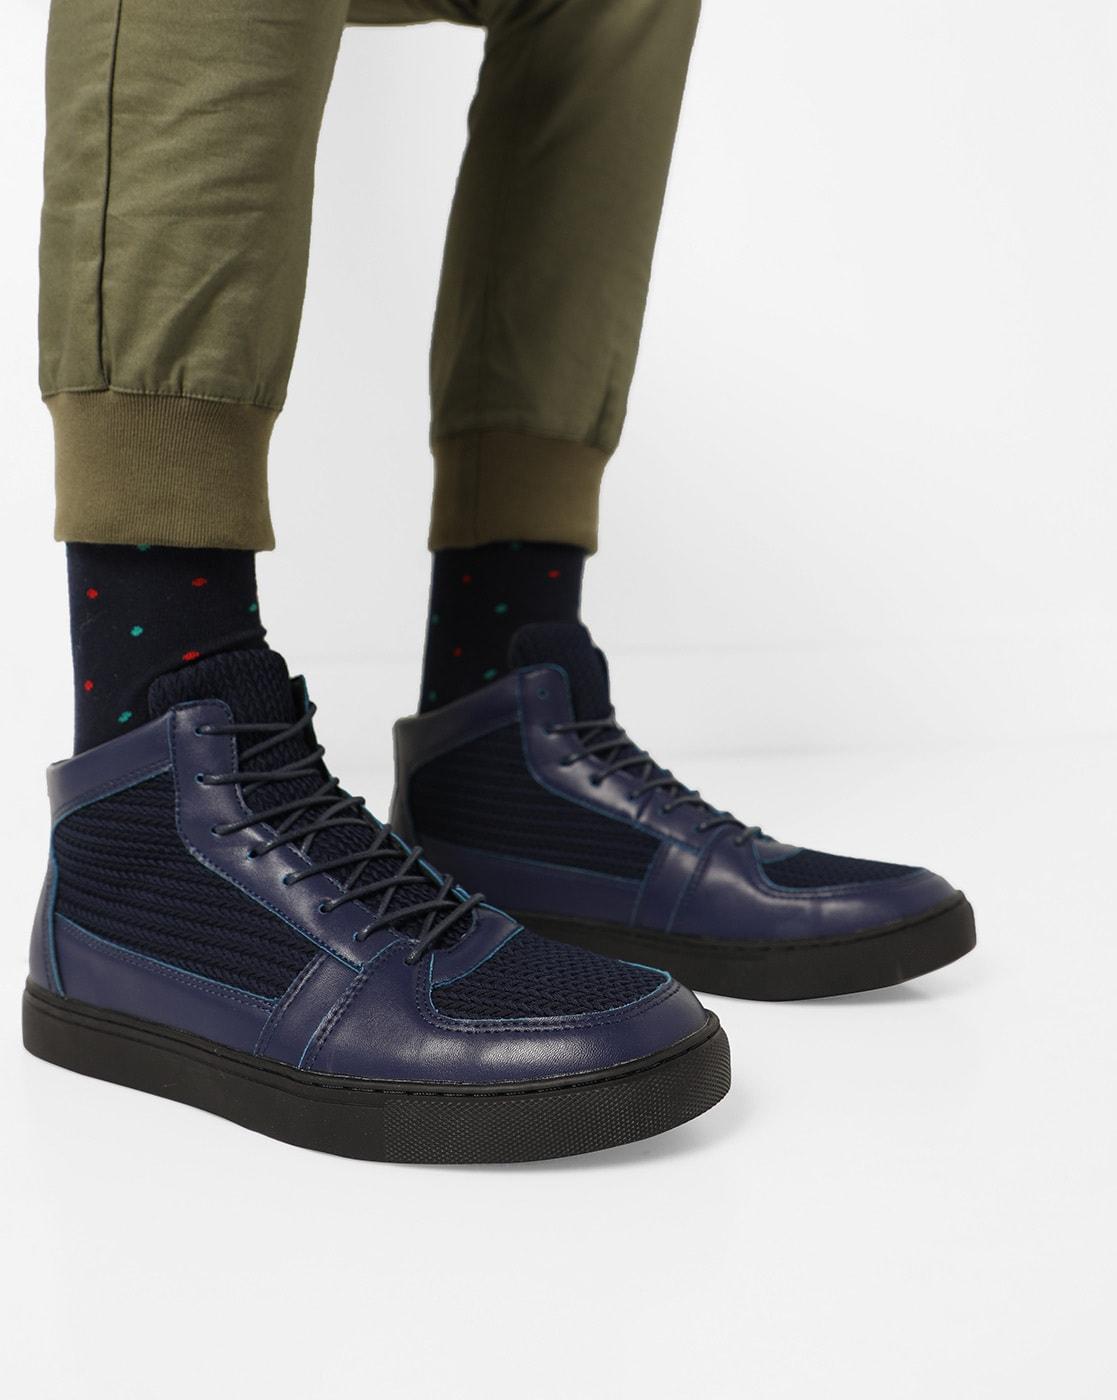 Buy Blue Sneakers for Men by AJIO